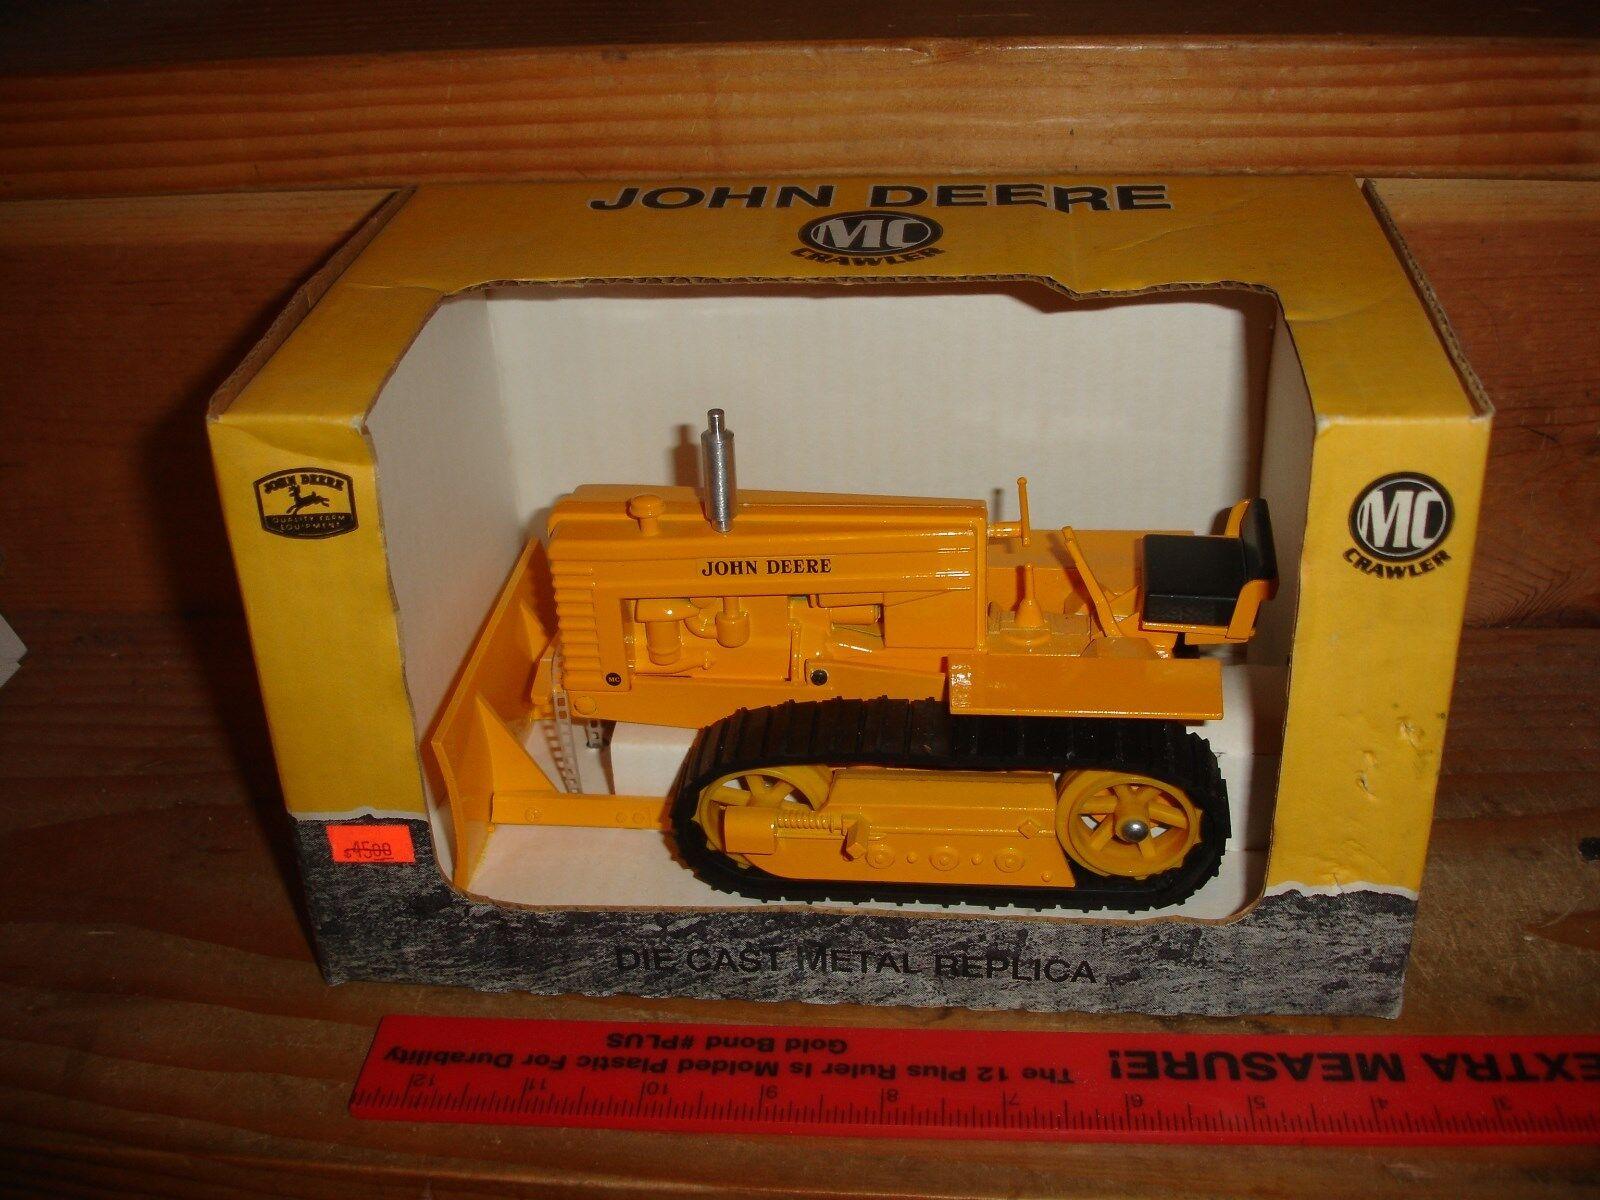 1 16 john deere MC industrial crawler in box